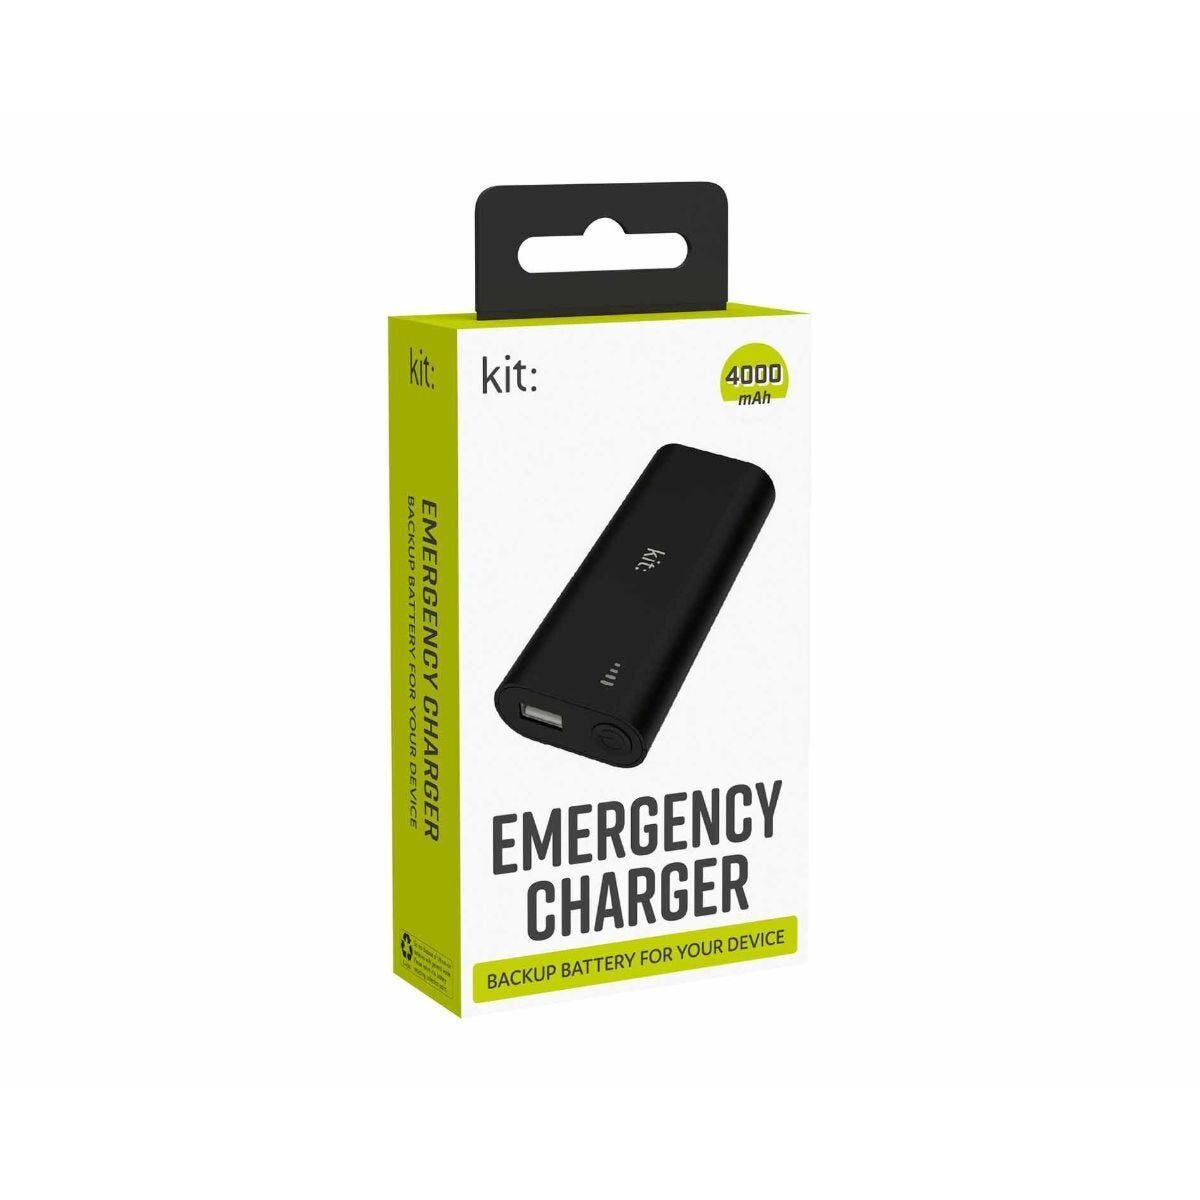 Kit Emergency Charger 4000mAh